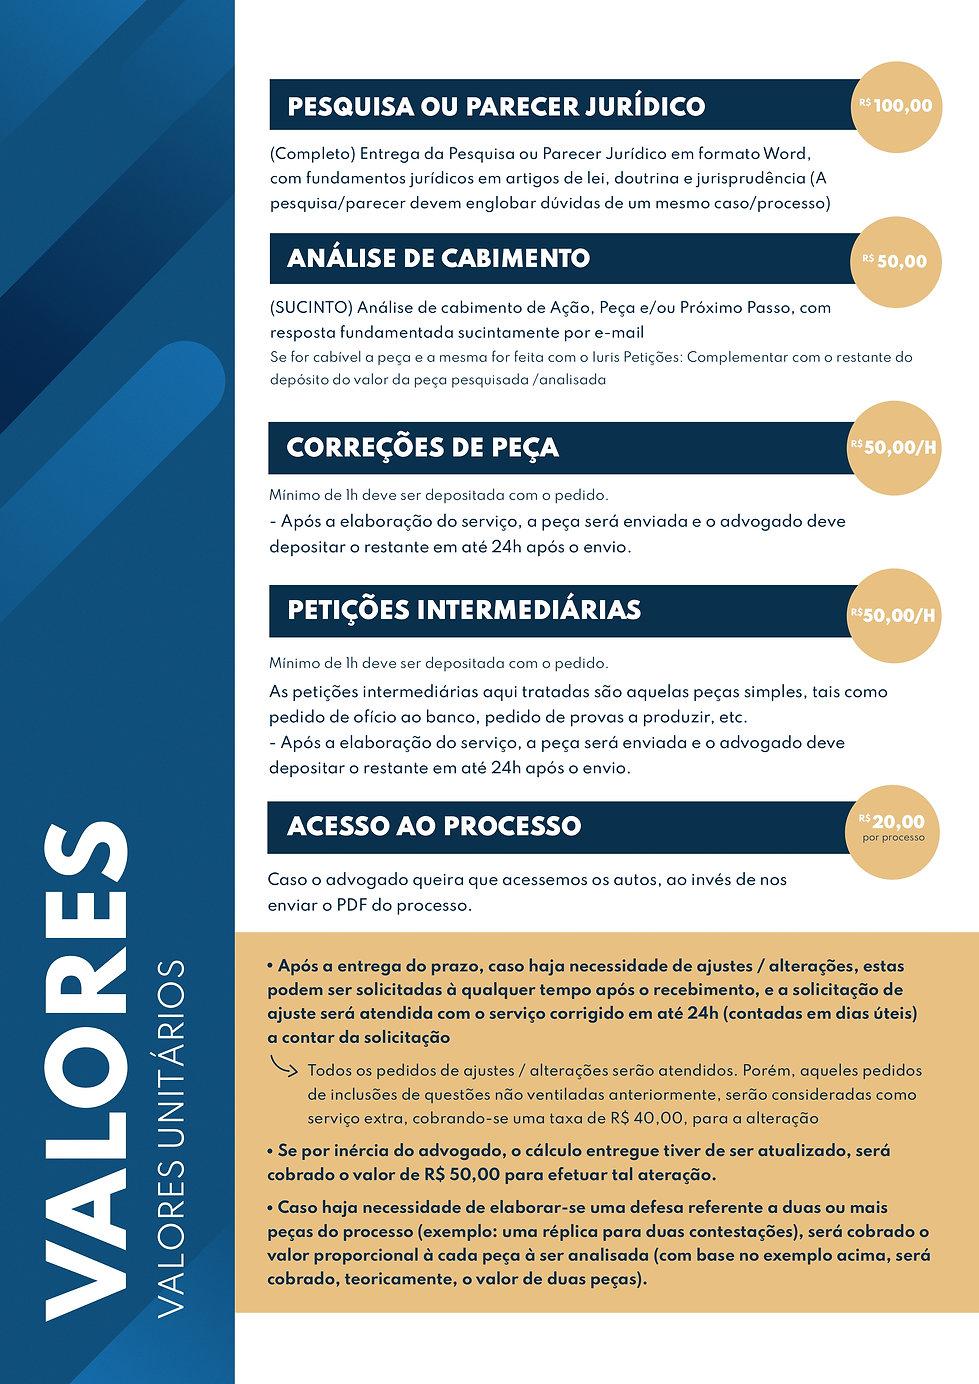 # CATÁLOGO IURIS PETIÇÕES_page-0006.jpg